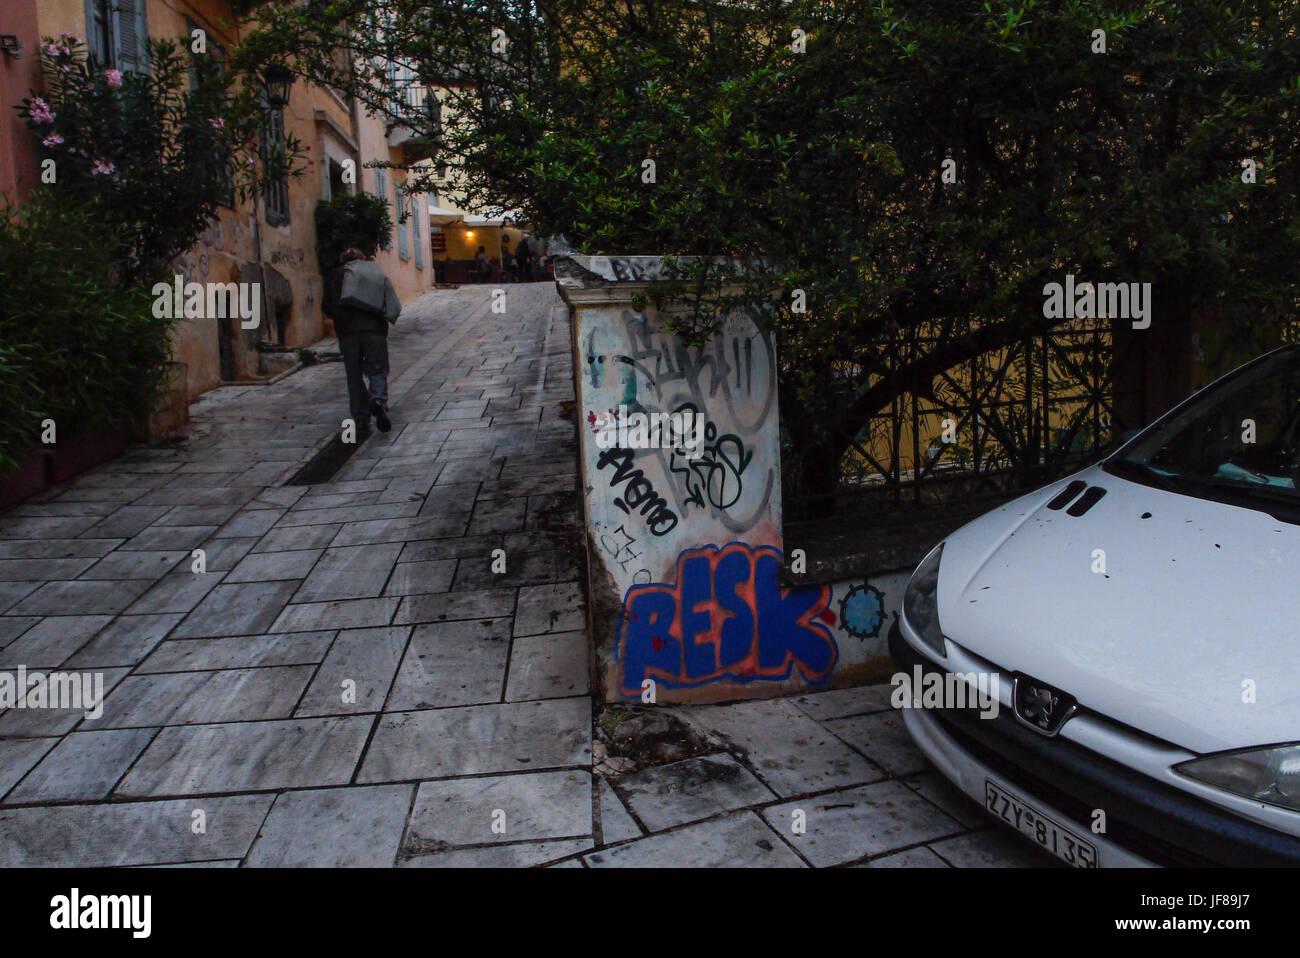 General views of Plaka area, Athens  (Greece) - Stock Image